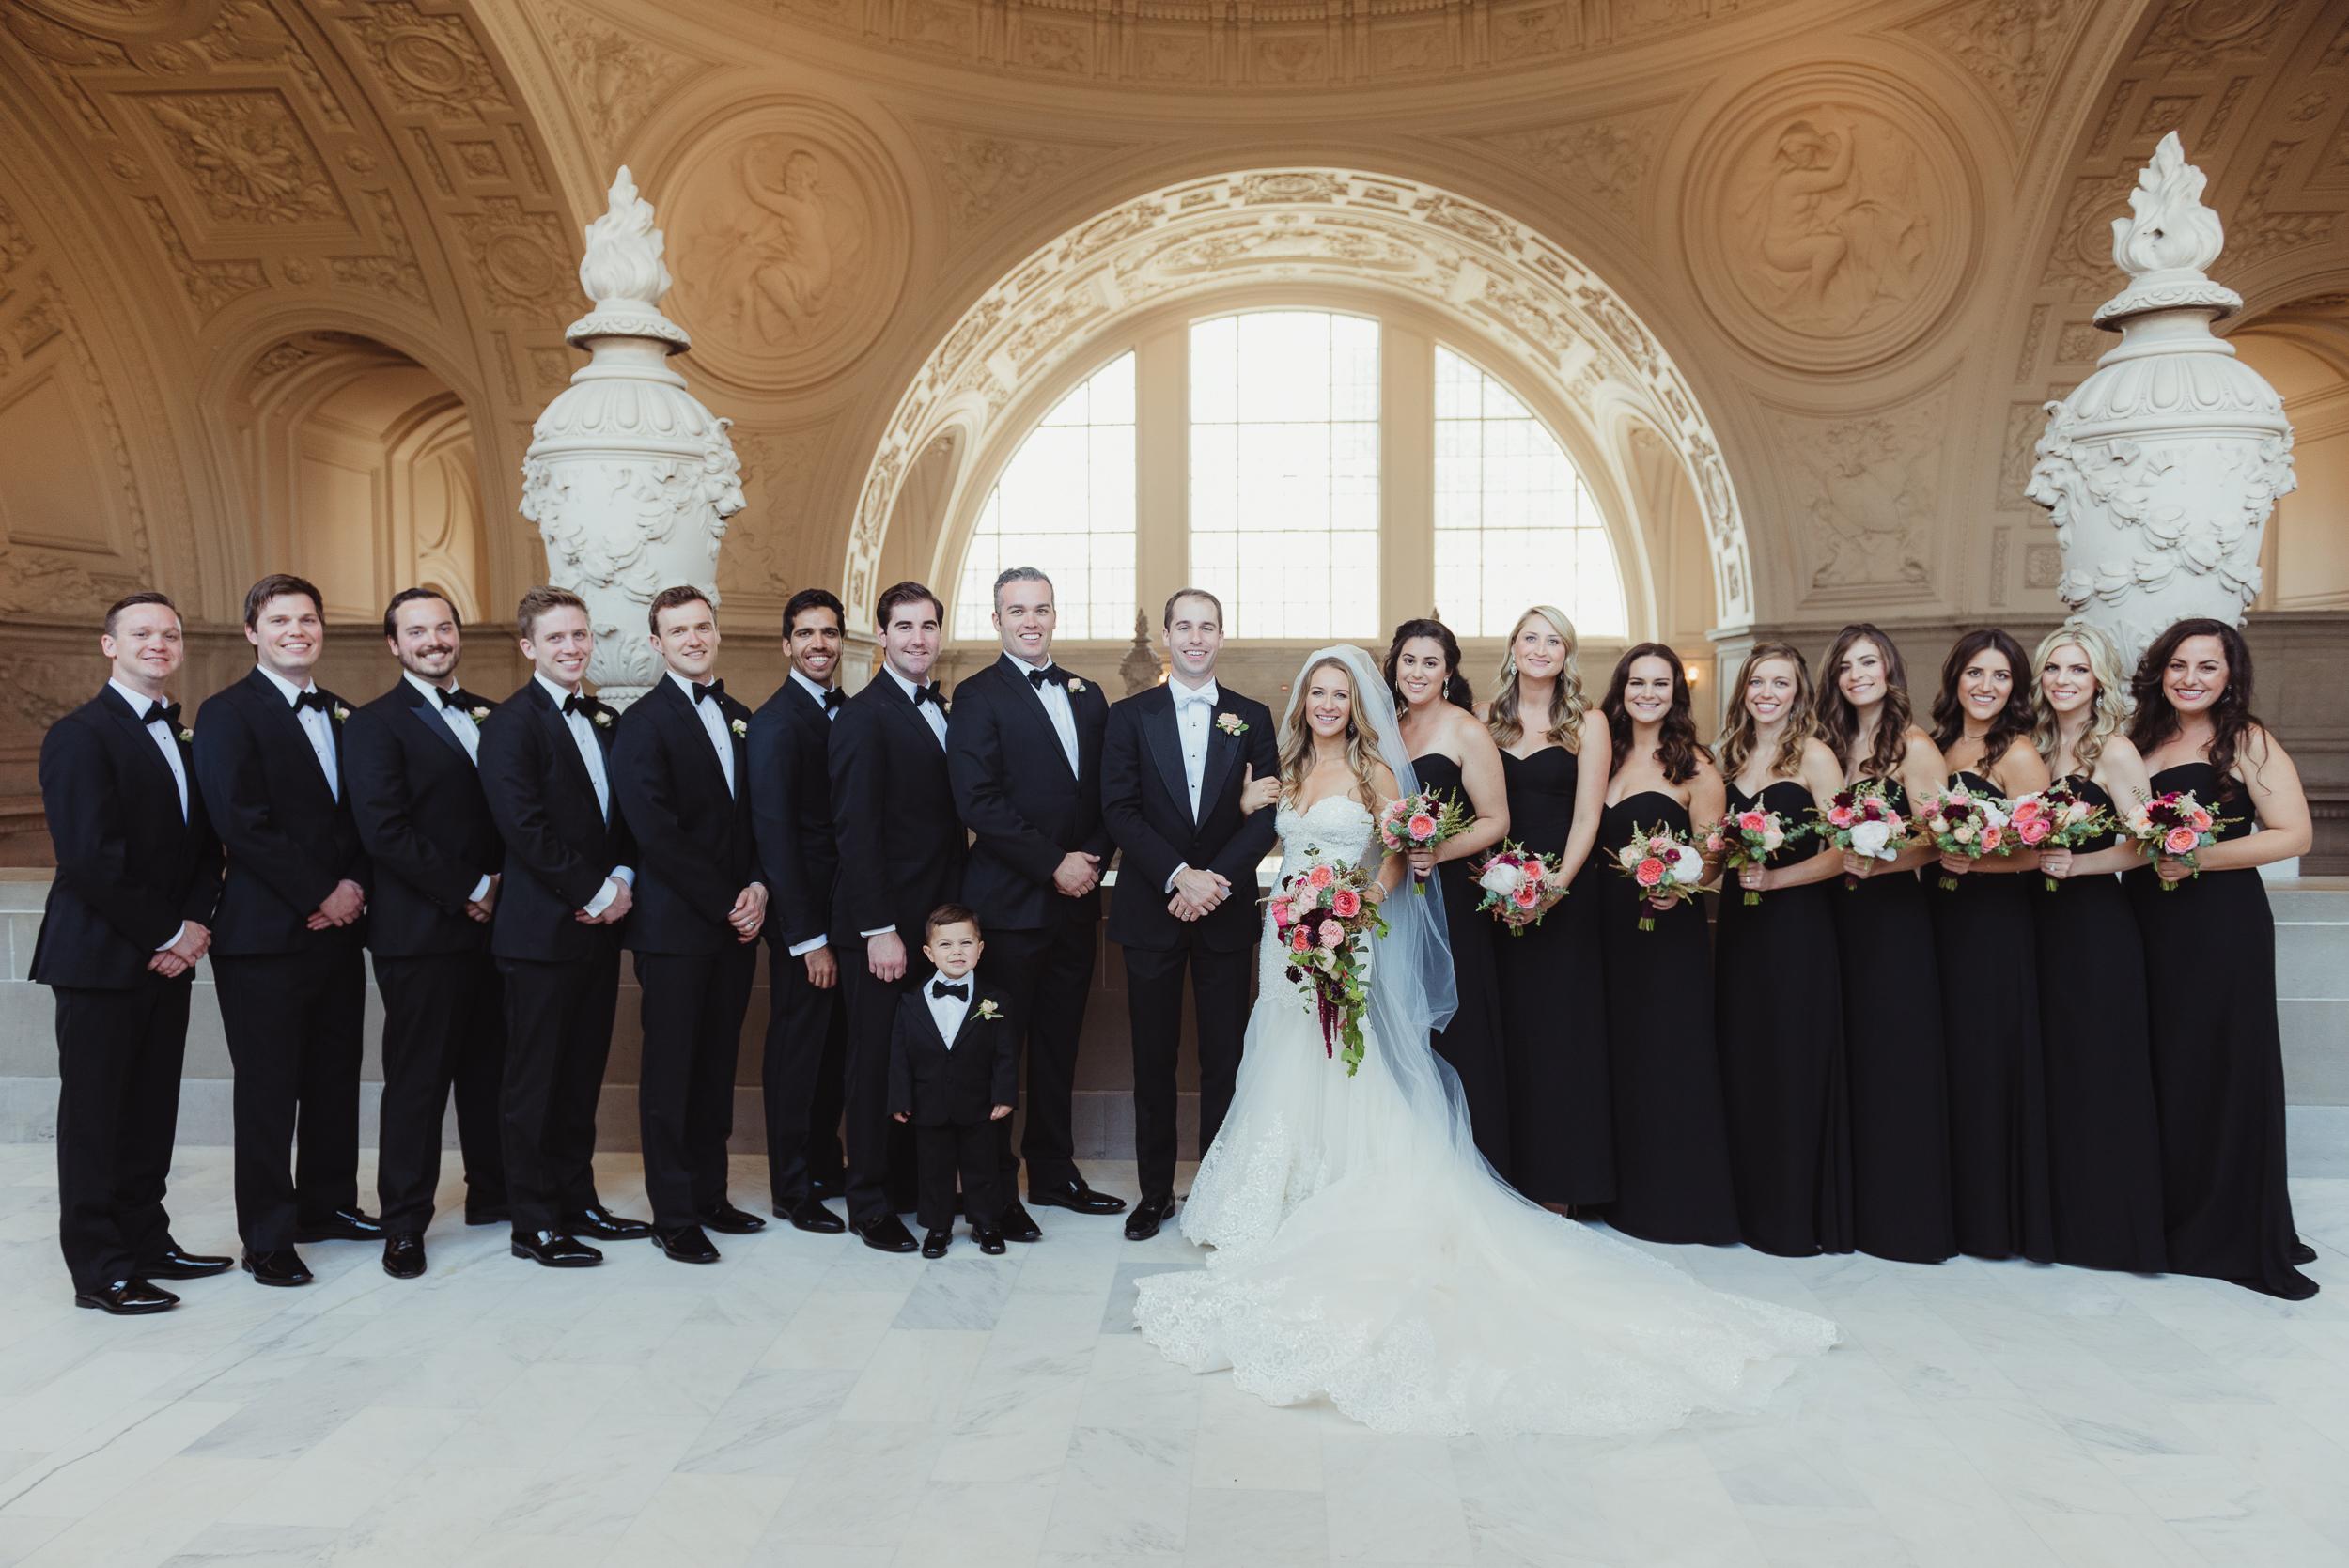 44-elegant-san-francisco-city-hall-wedding-vivianchen-0594.jpg